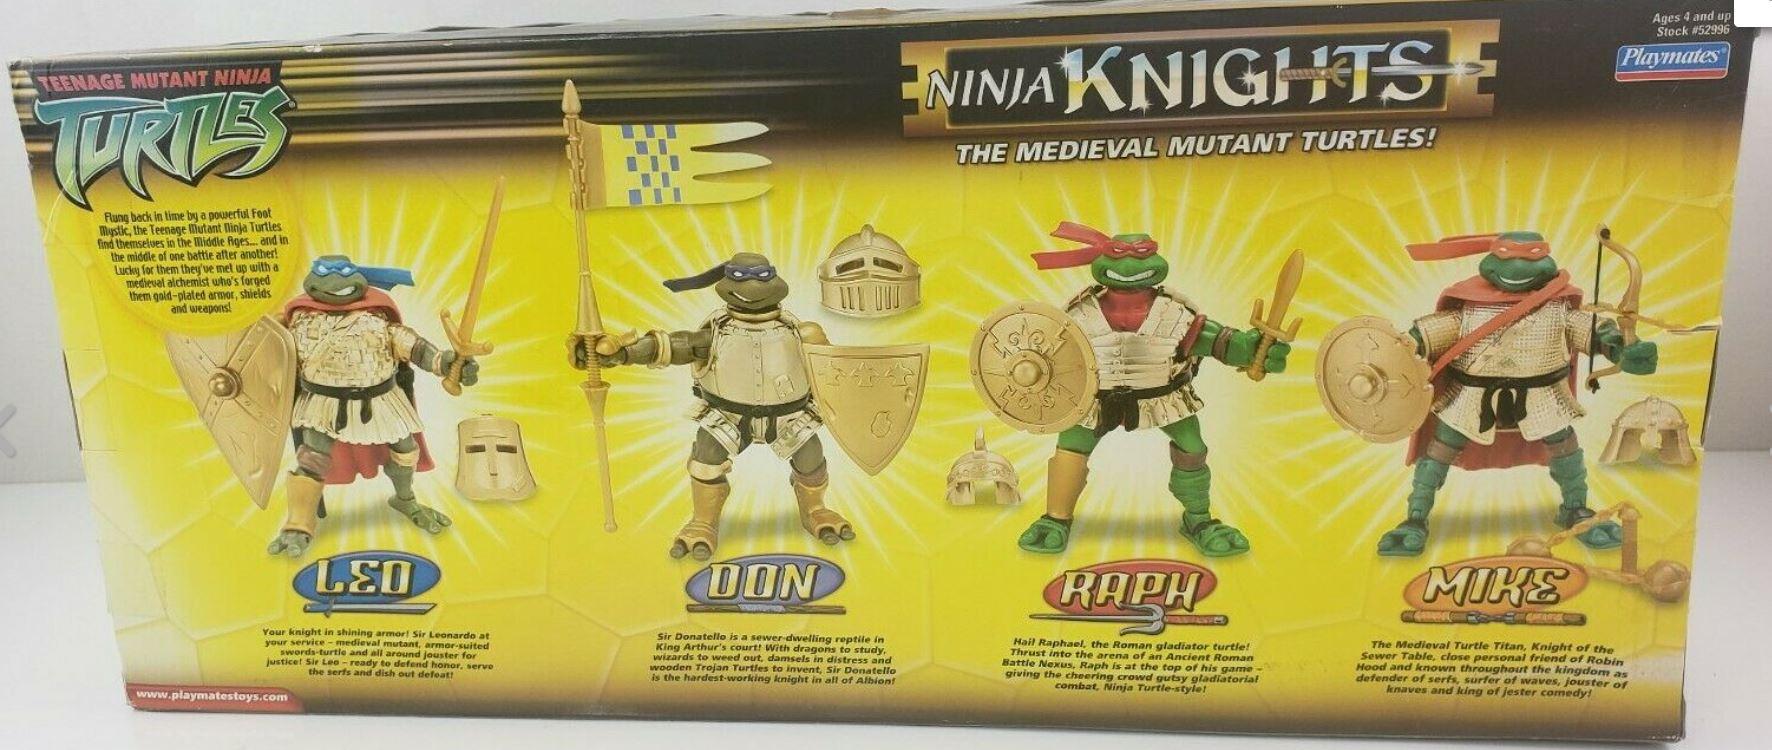 Ninja Knights Golden Box Set